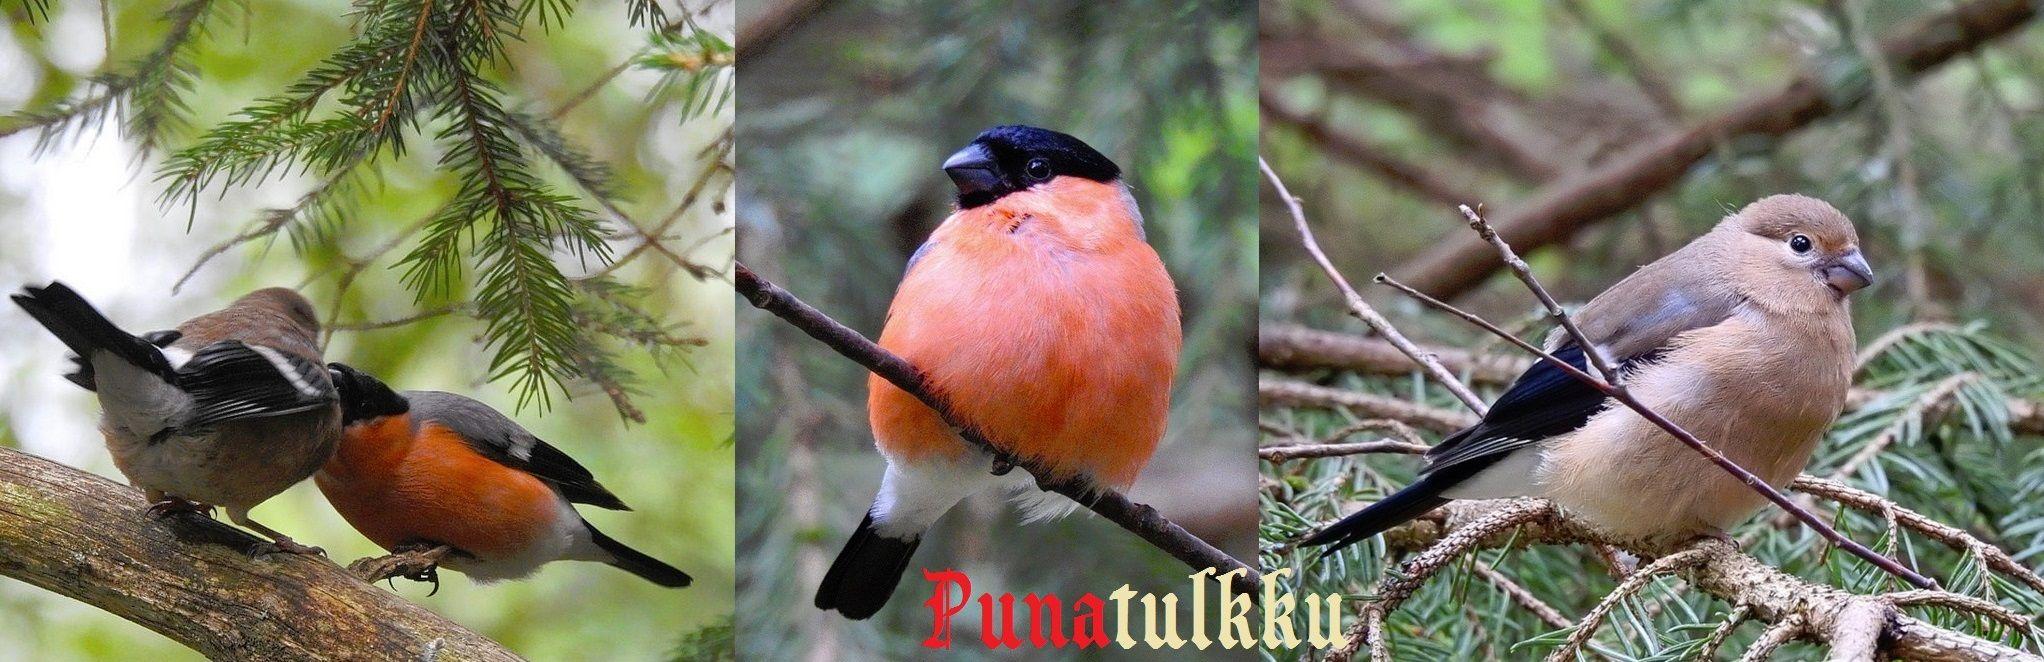 PUNATULKKU (Pyrrhula pyrrhula) - (Linnaeus, 1758)